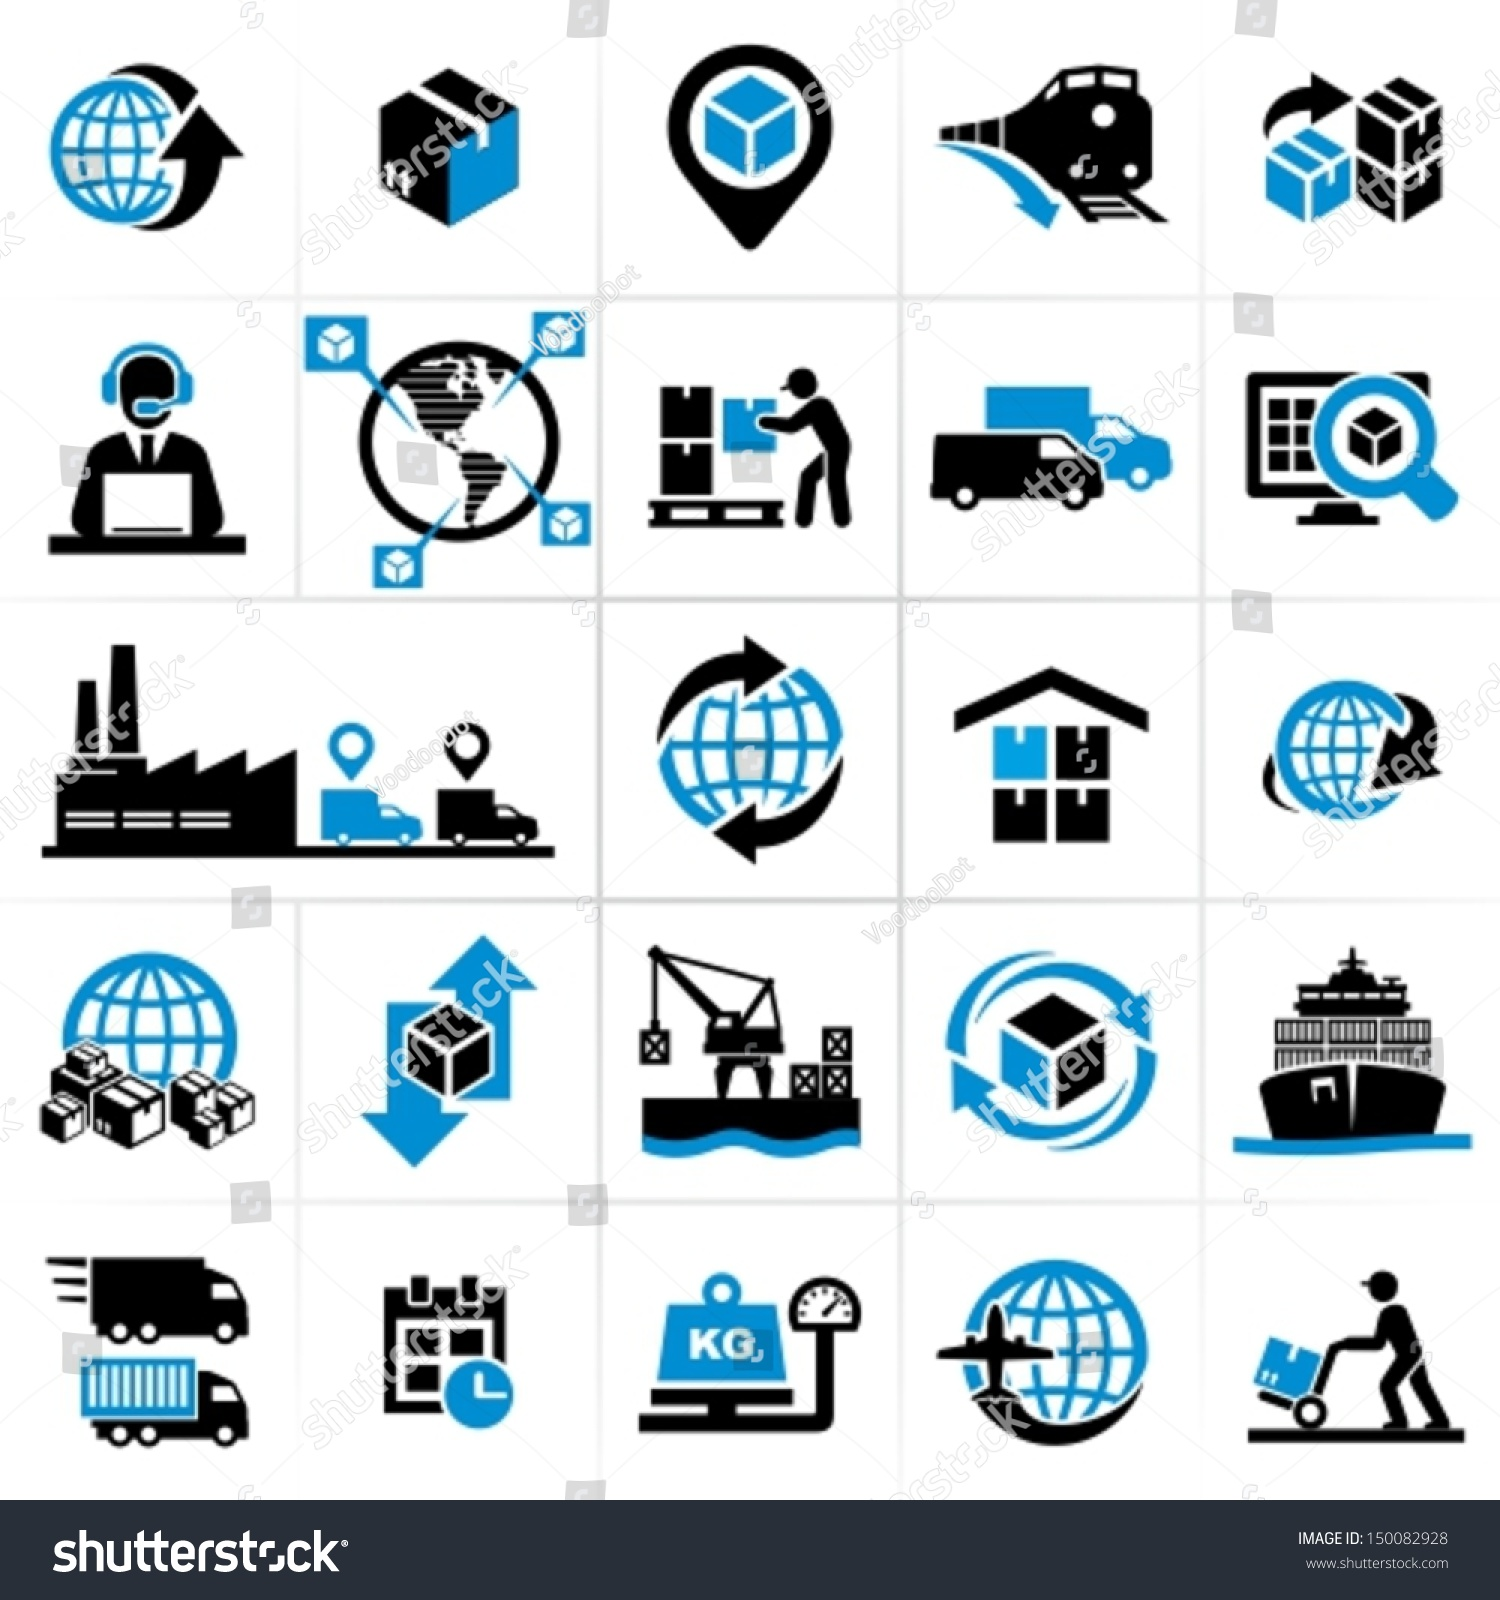 Royalty-free Logistics icons #150082928 Stock Photo ...